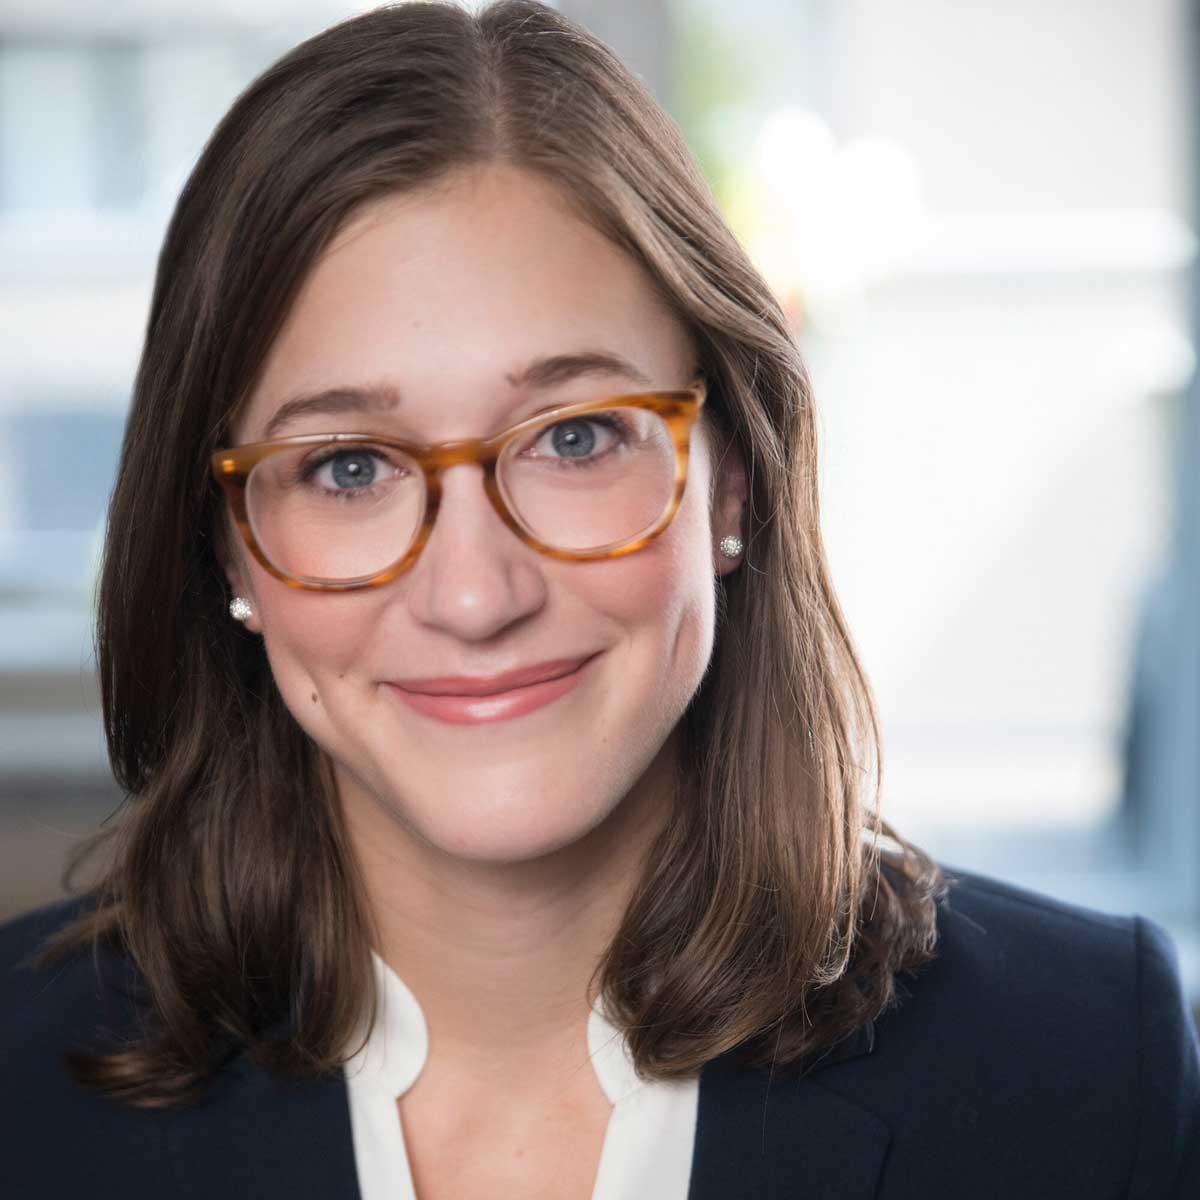 ArtSmart mentor Julia Kershetsky